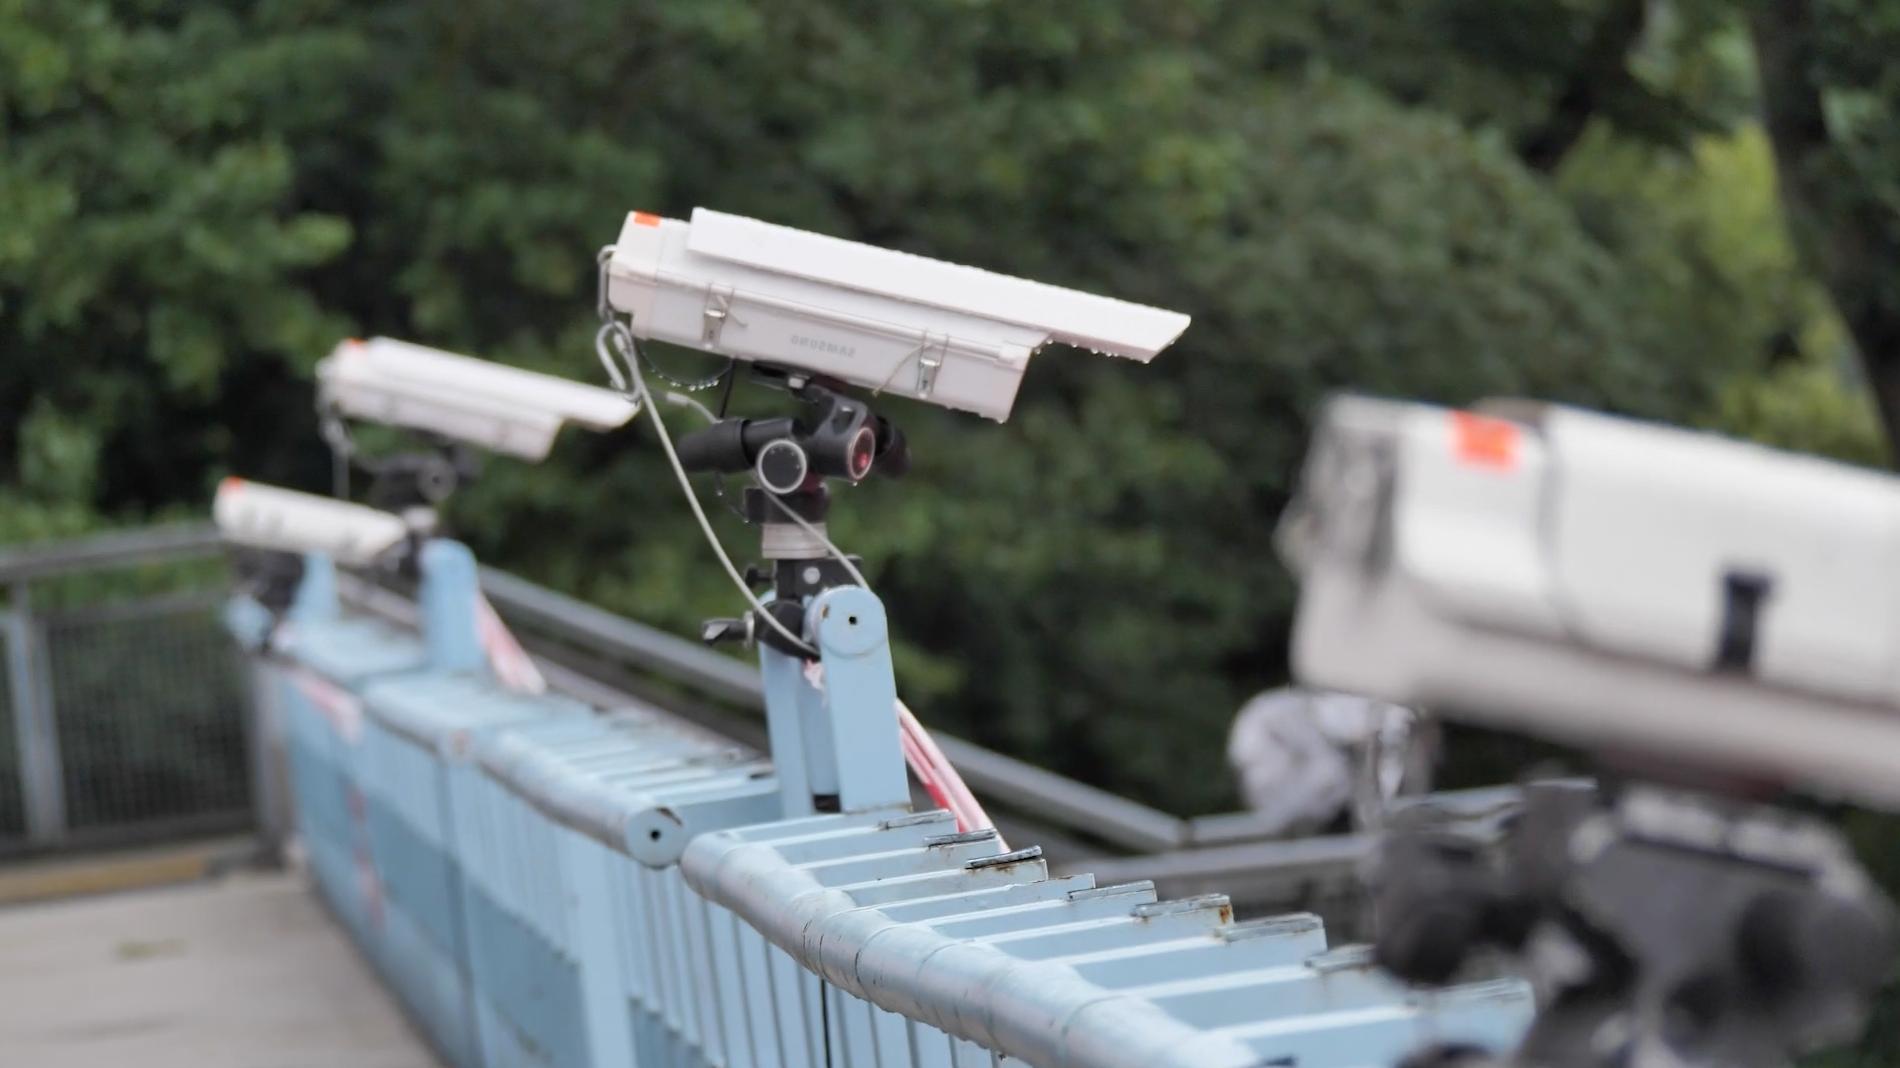 Hawk-Eye high speed cameras overlooking an athletic event in 2020 (HAWK-EYE INNOVATIONS)